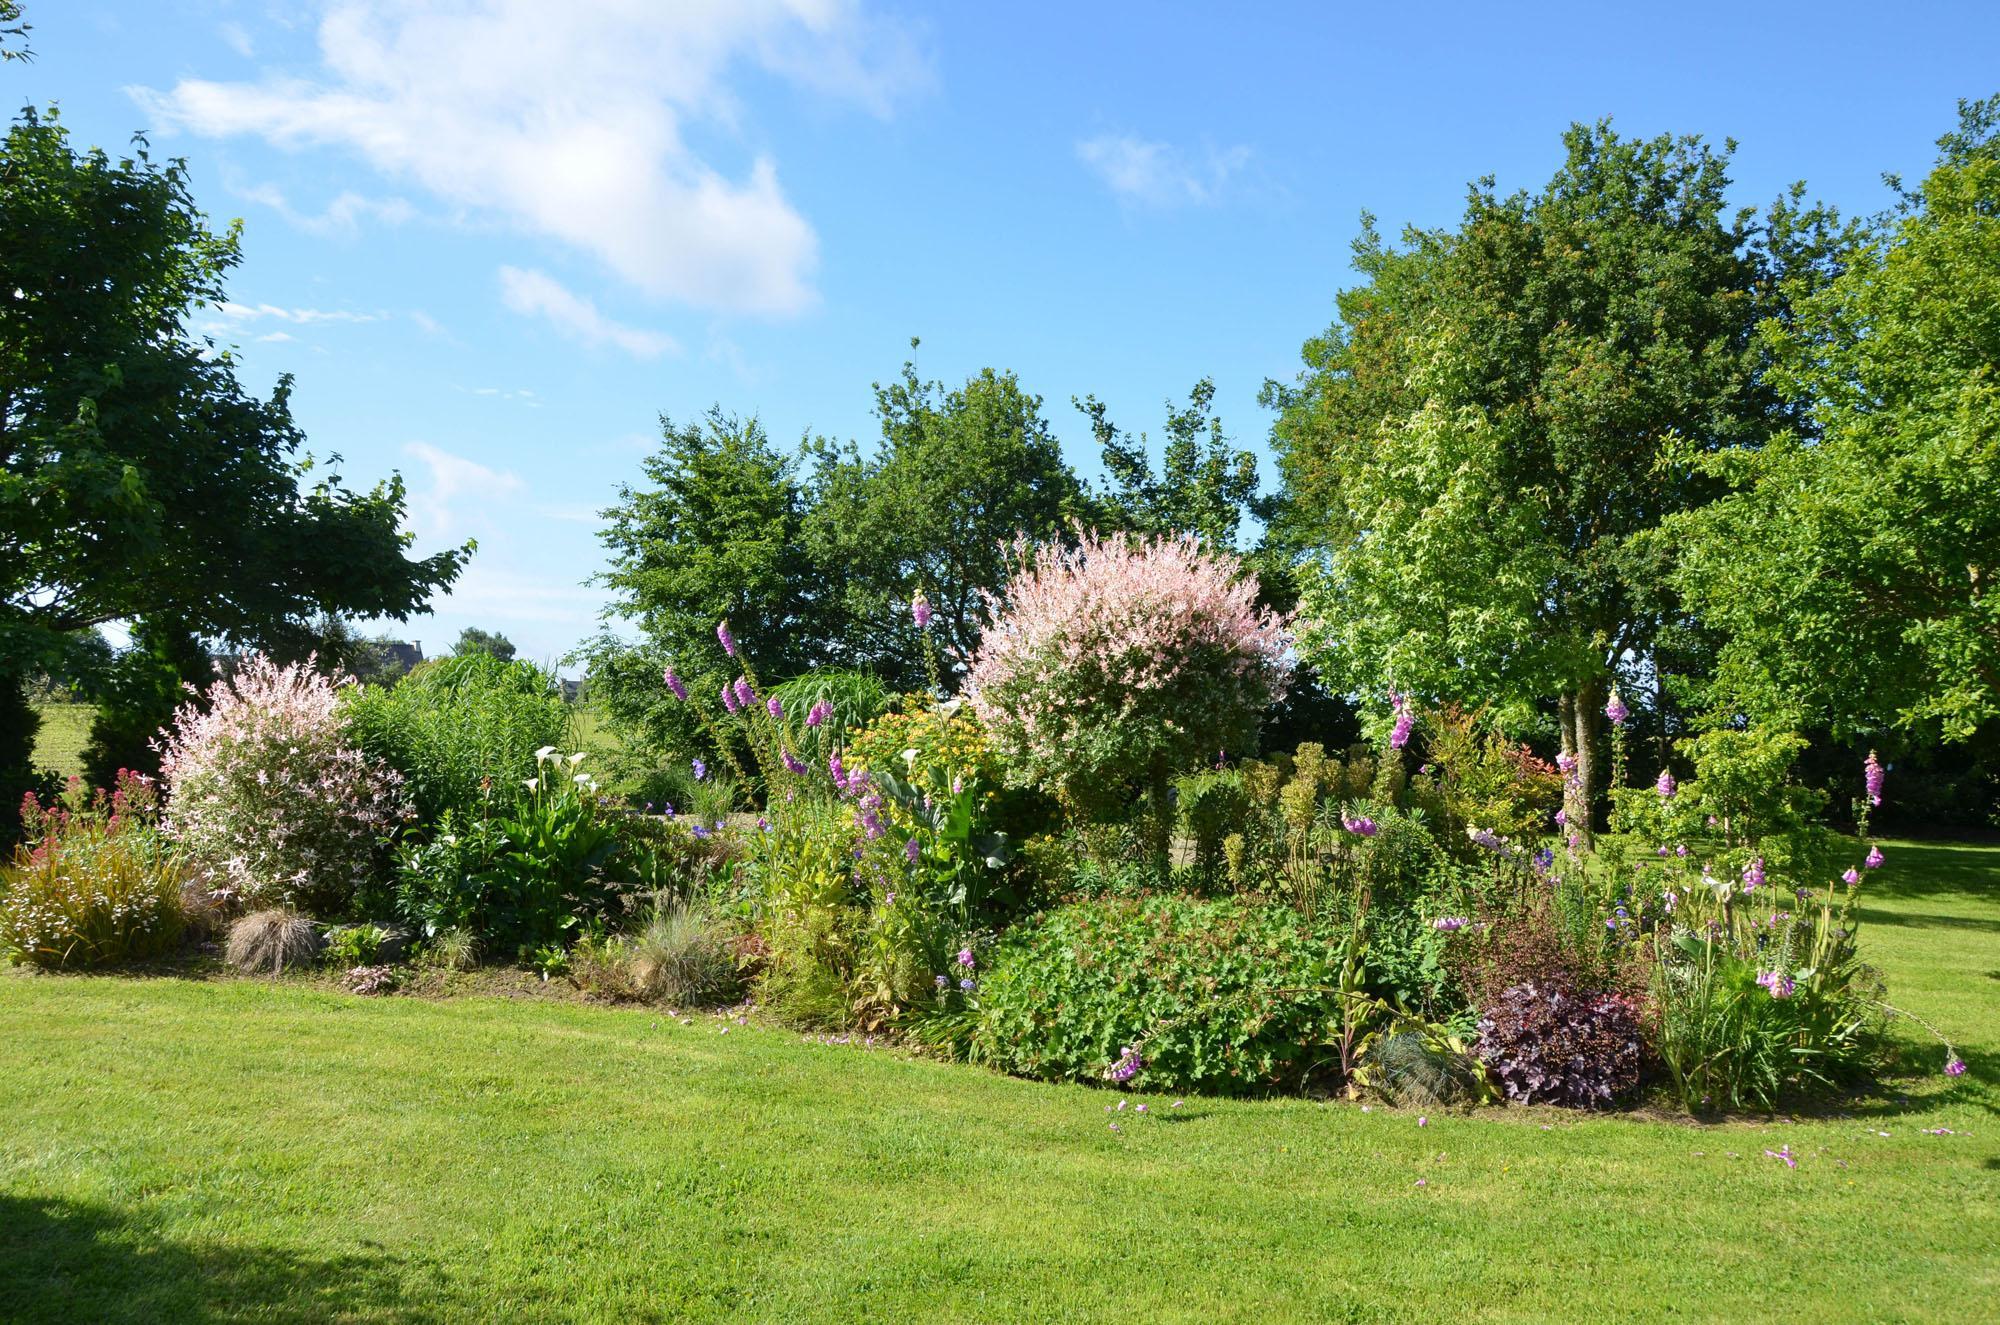 Bienvenue dans mon jardin 11 g te de la b zardais for Bienvenue dans mon jardin